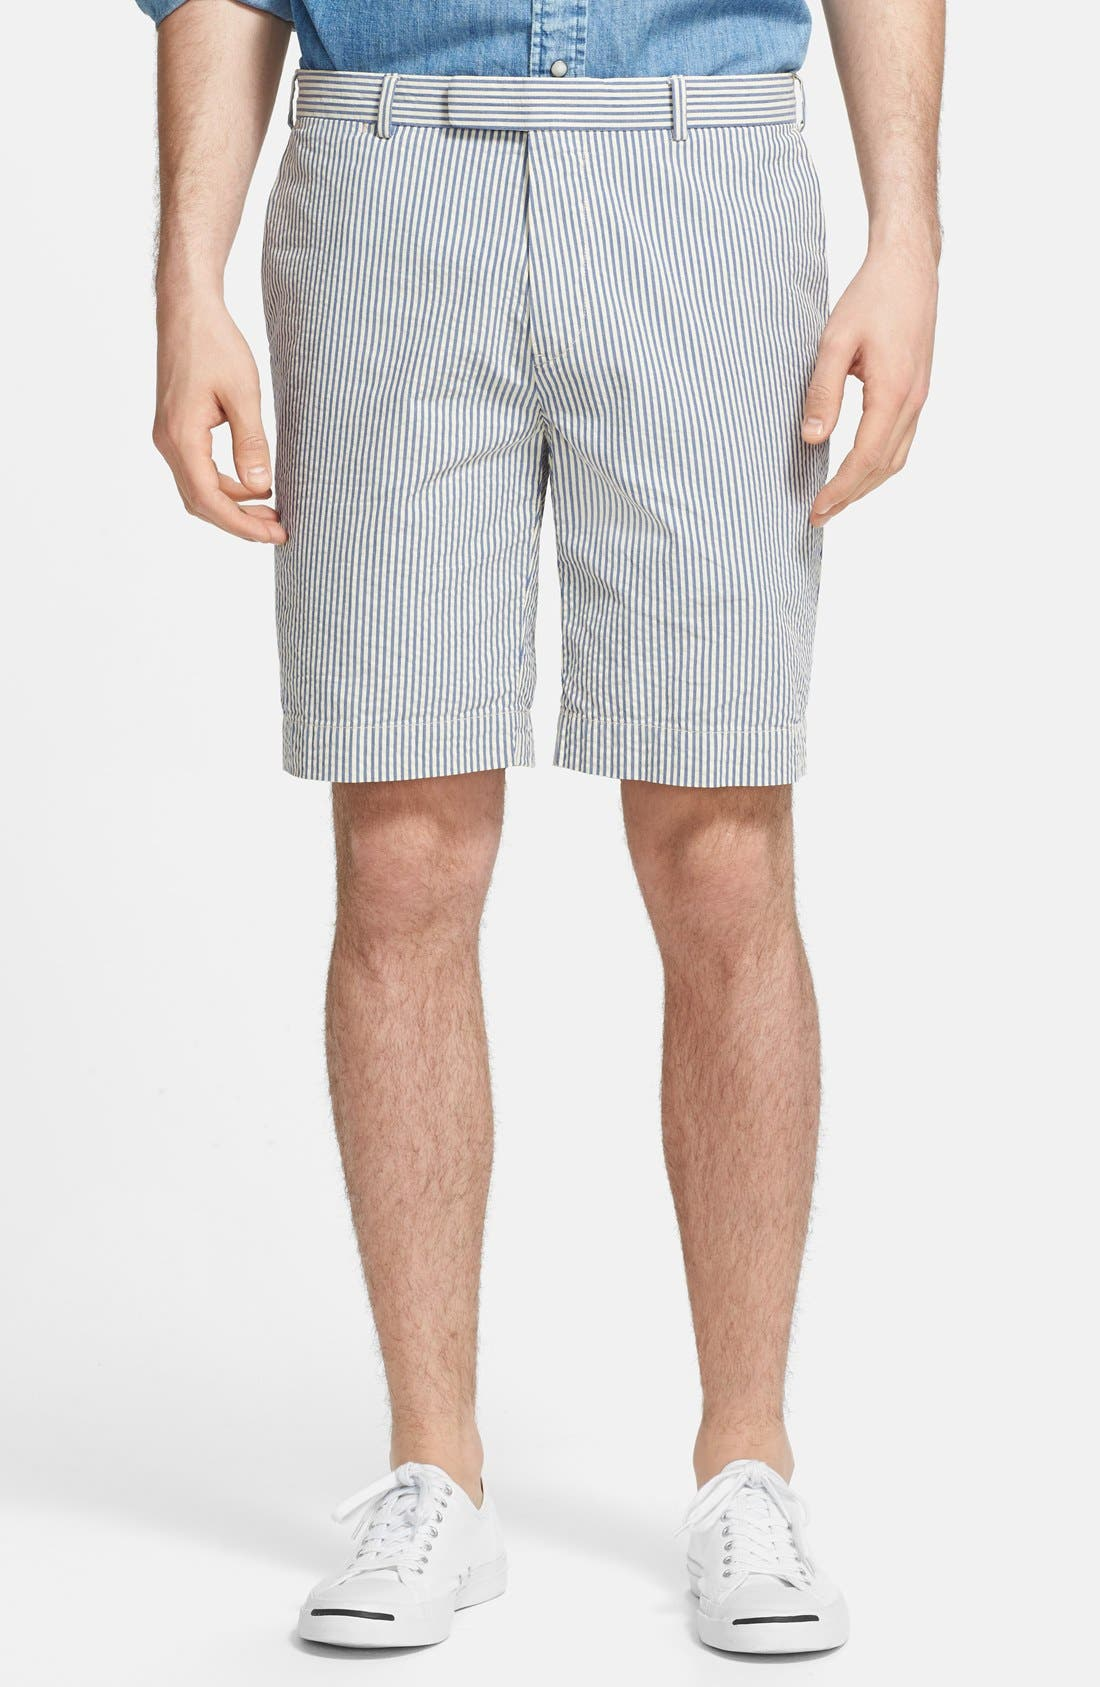 Alternate Image 1 Selected - Polo Ralph Lauren Straight Fit Cotton Seersucker Shorts